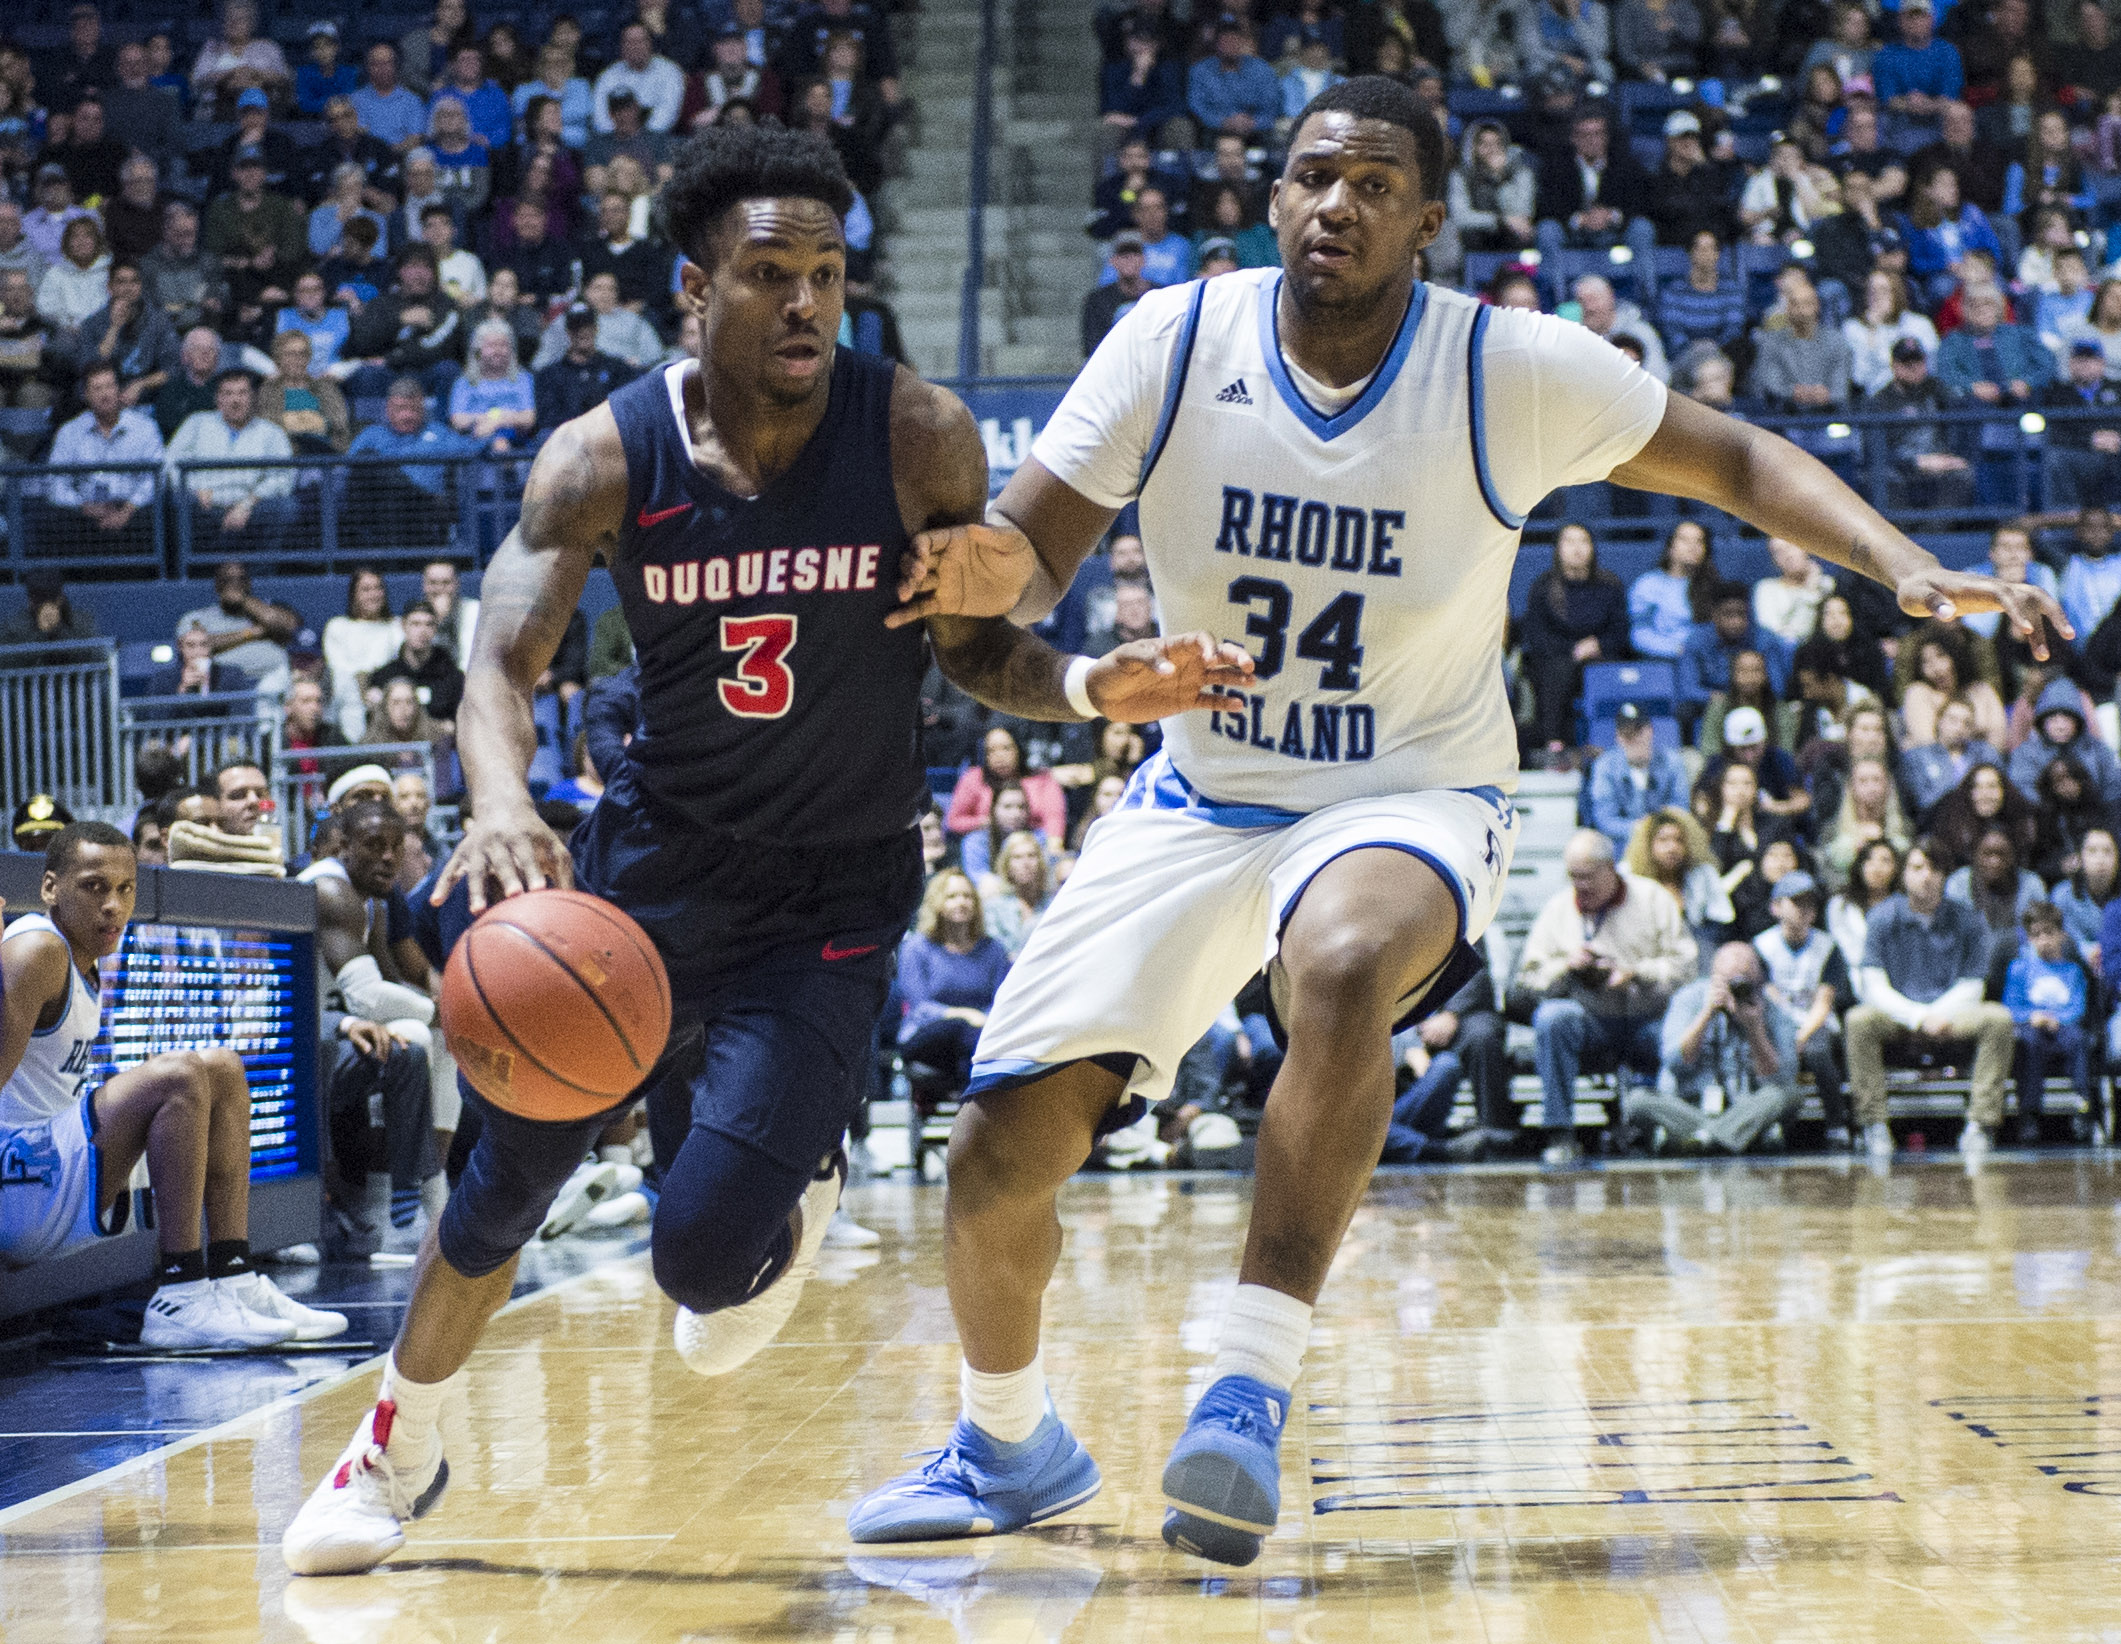 NCAA Basketball: Duquesne at Rhode Island